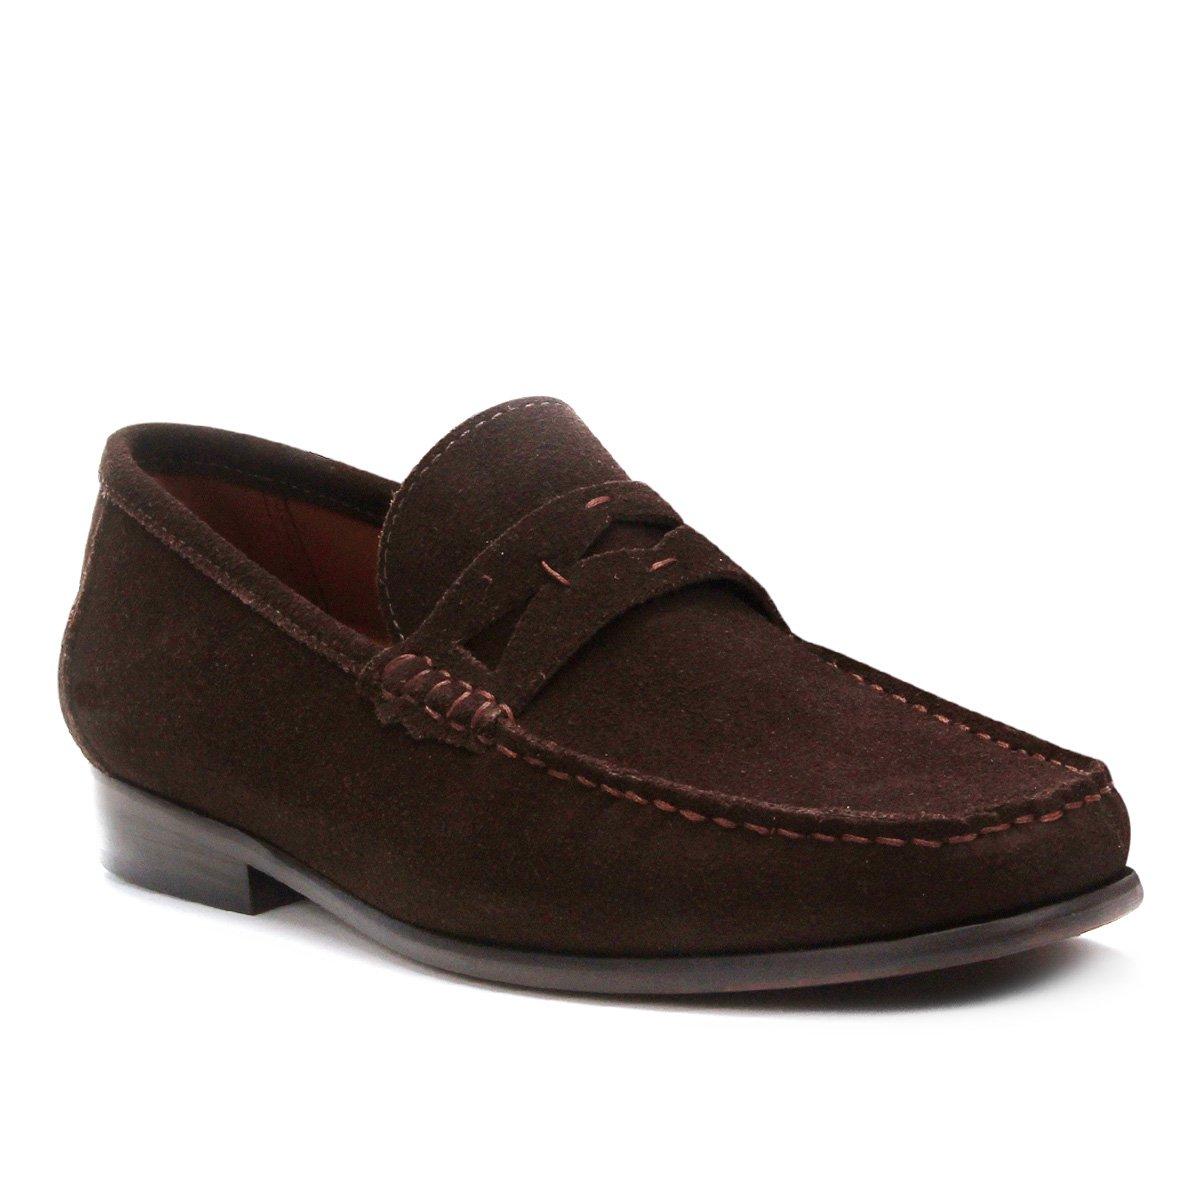 Mocassim Couro Shoestock Camurça Gravata Masculino